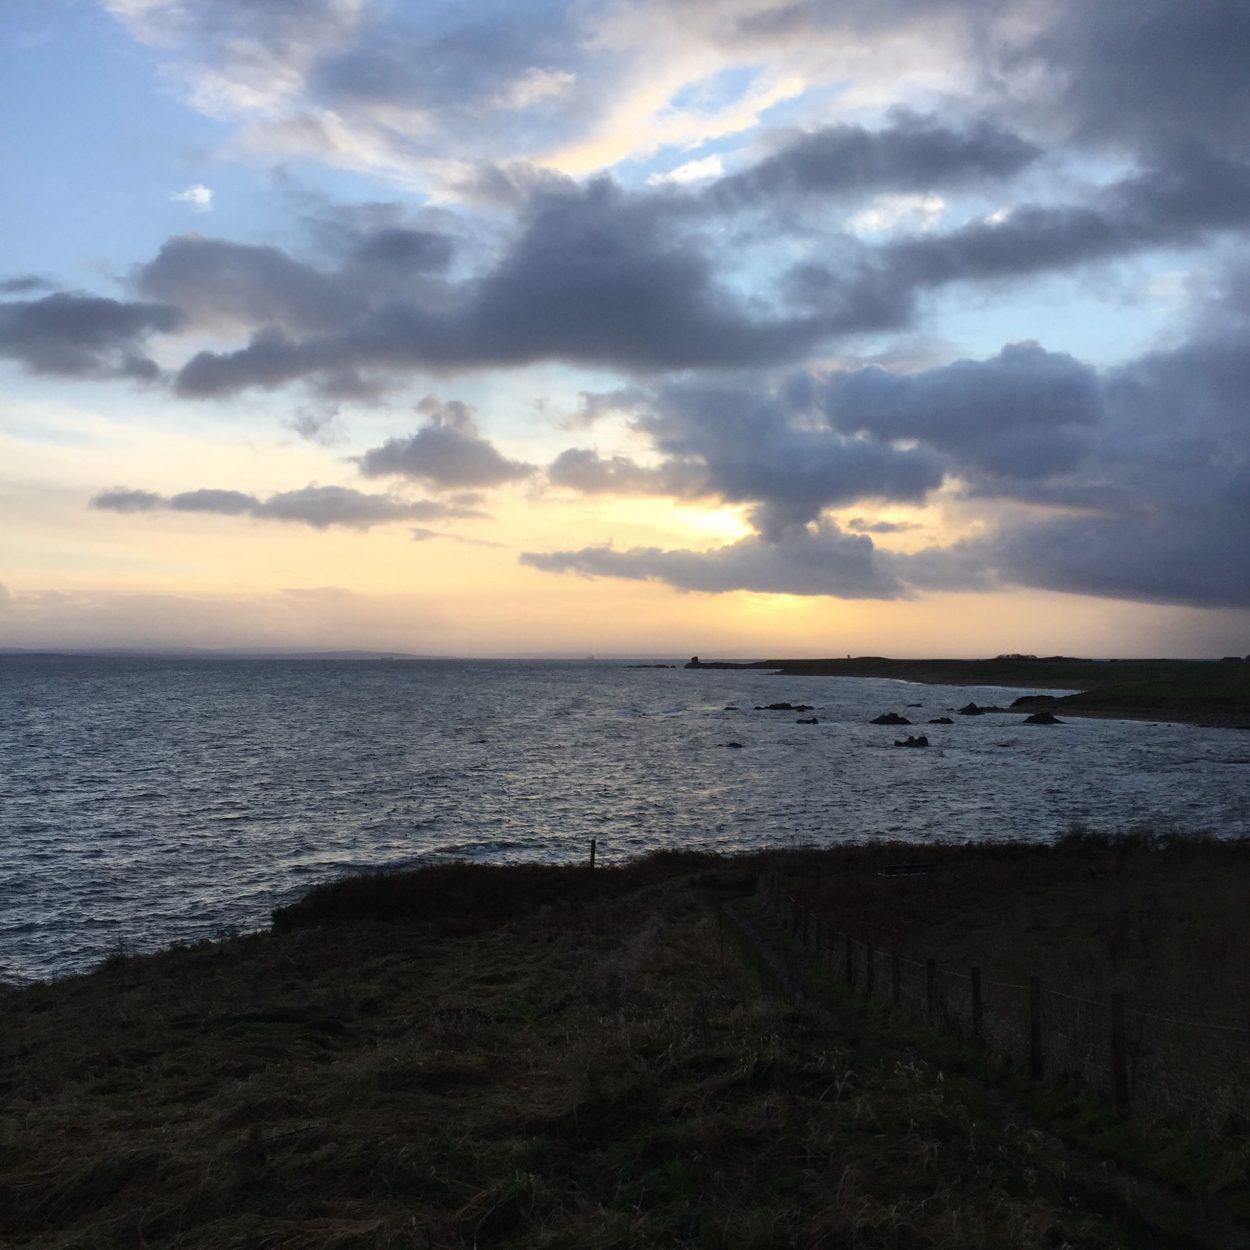 St Monans at sunset